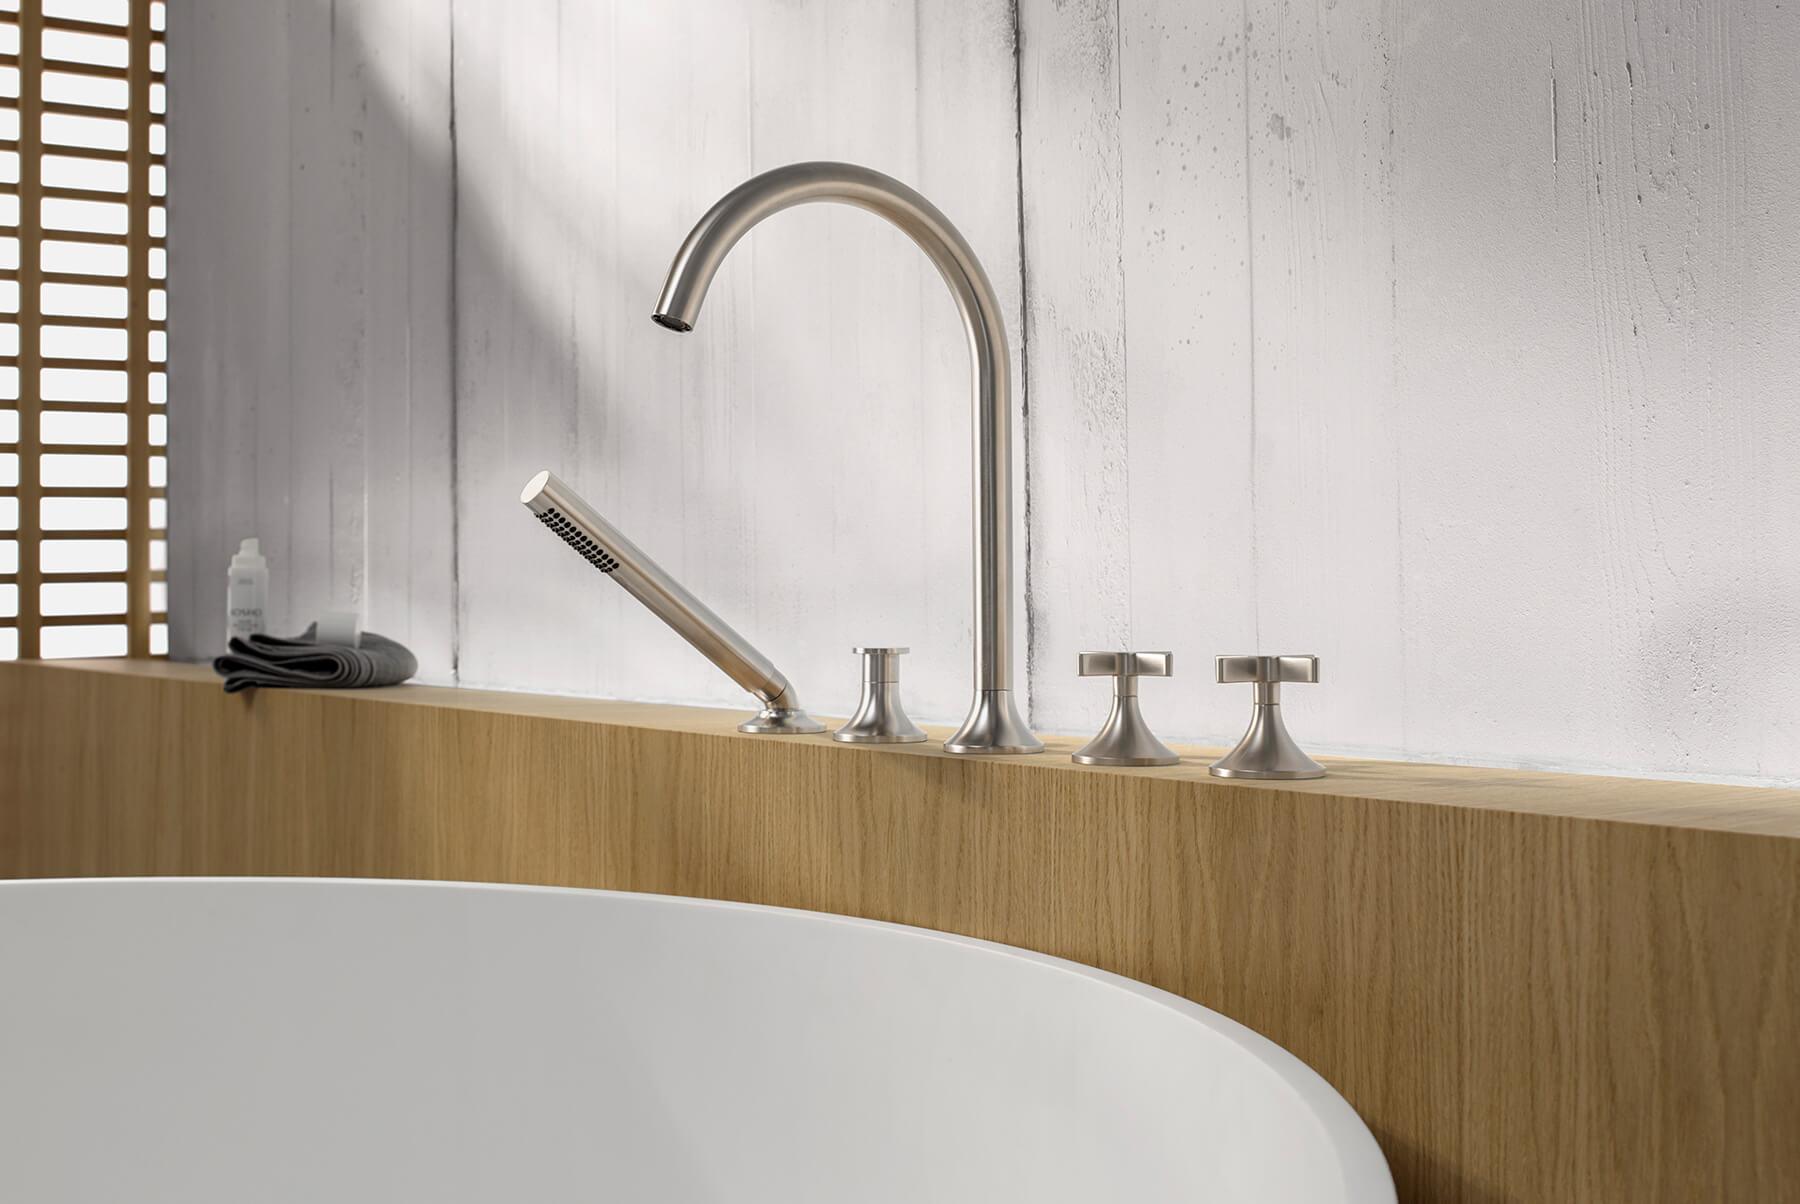 Brassware-Dornbracht-Vaia-Inset-4-1800x1204